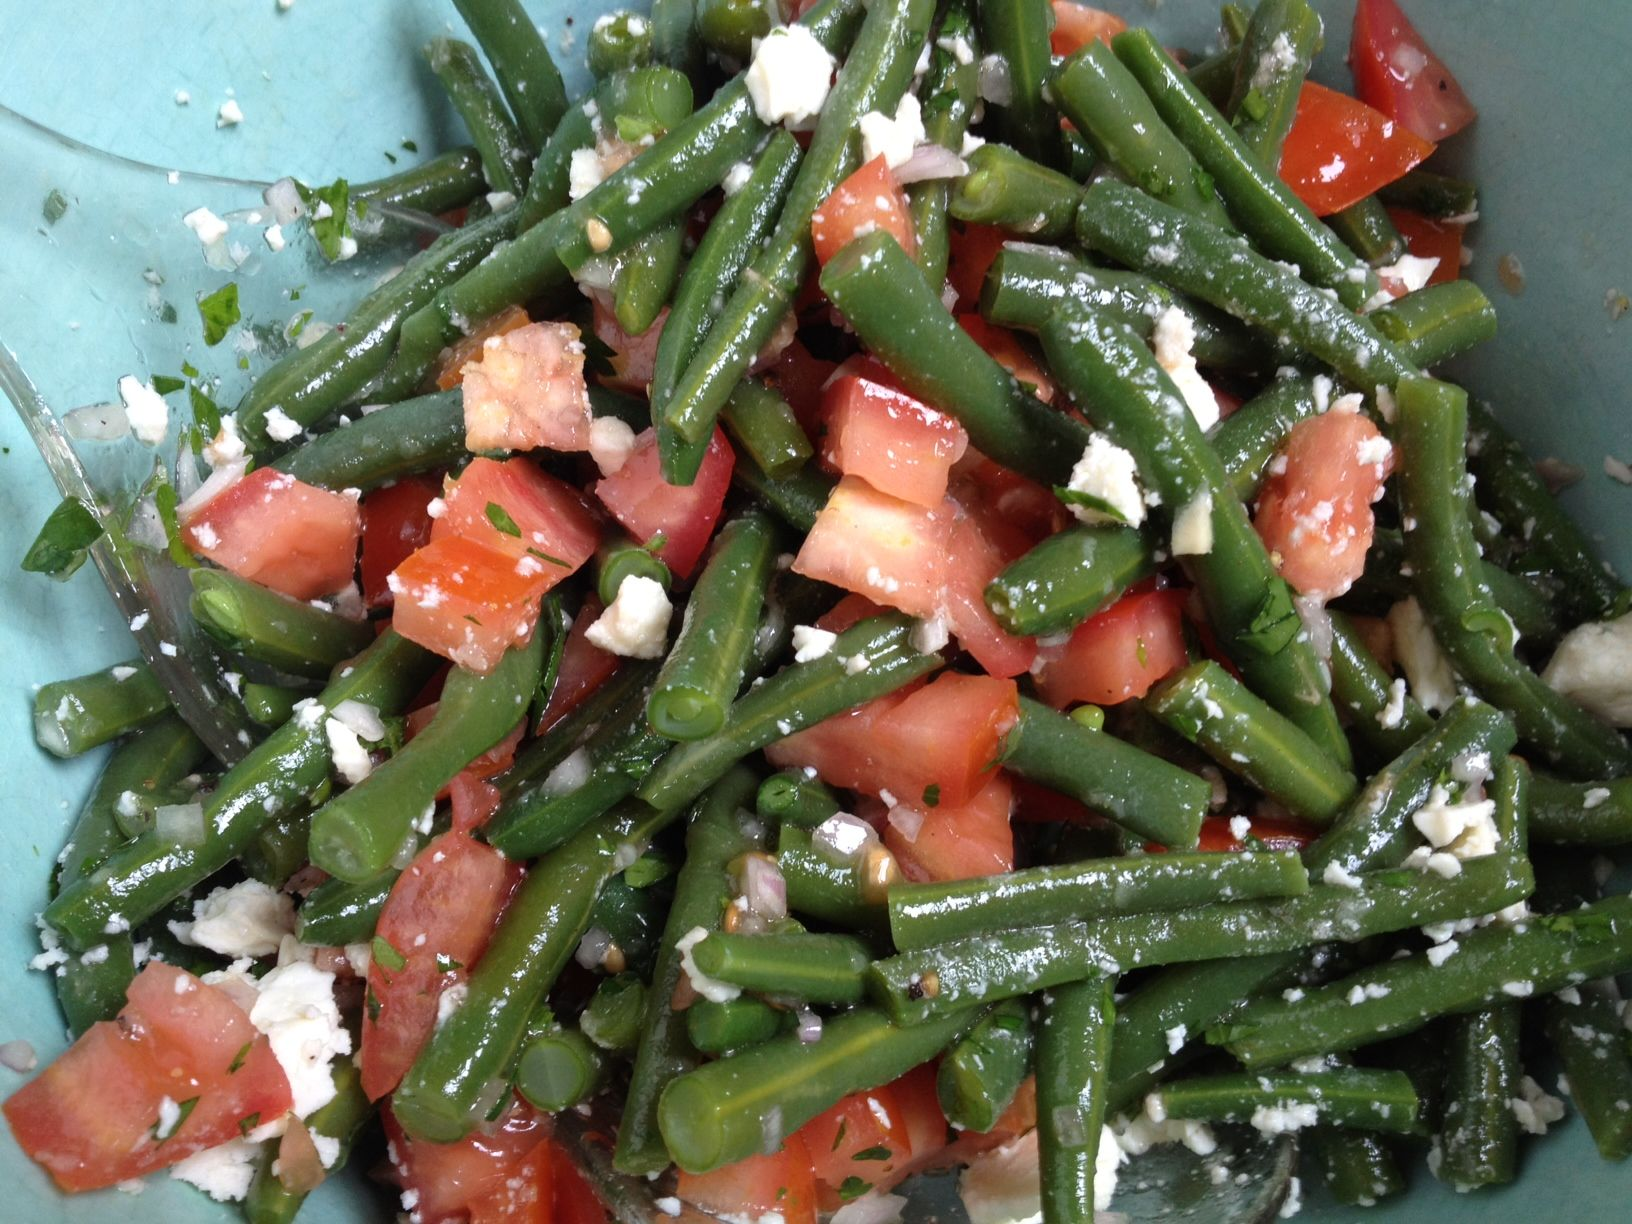 Greek Green Bean Salad with Feta and Tomatoes AllrecipesPhoto